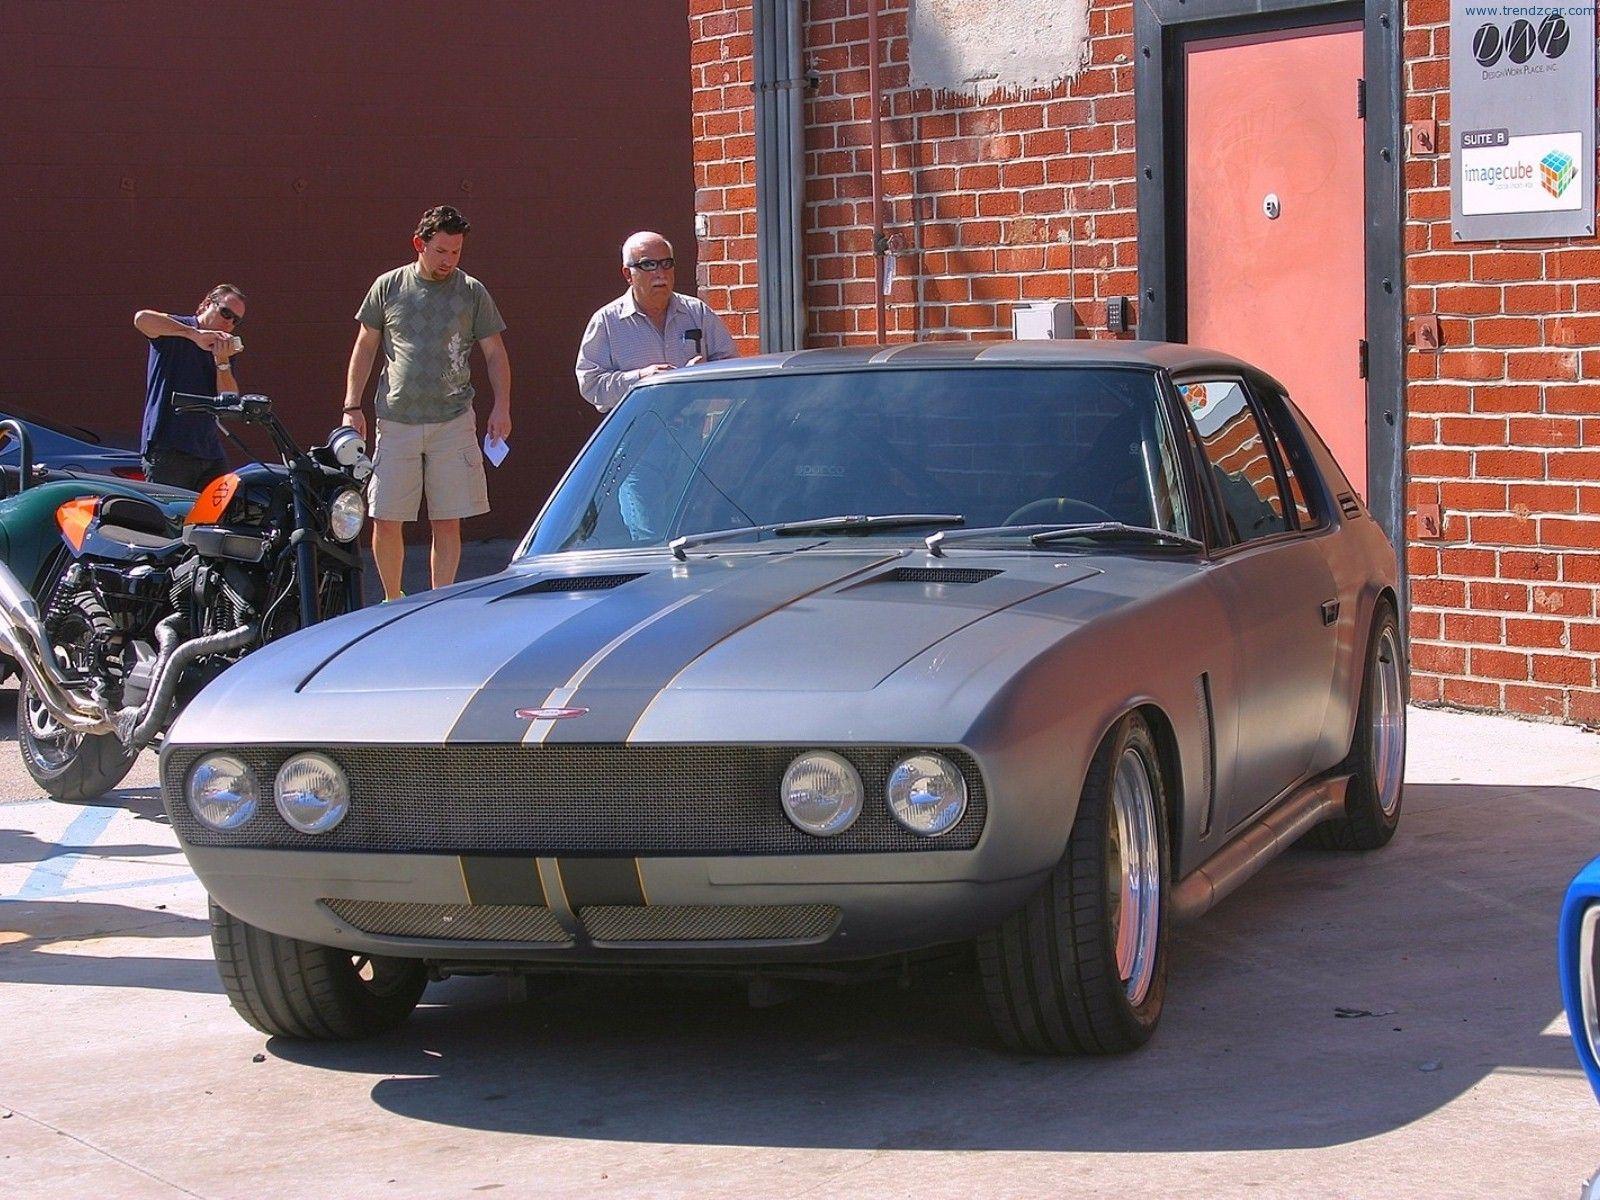 1971 Jensen Interceptor Front Angle  Fast  Furious 6 Car  Fast